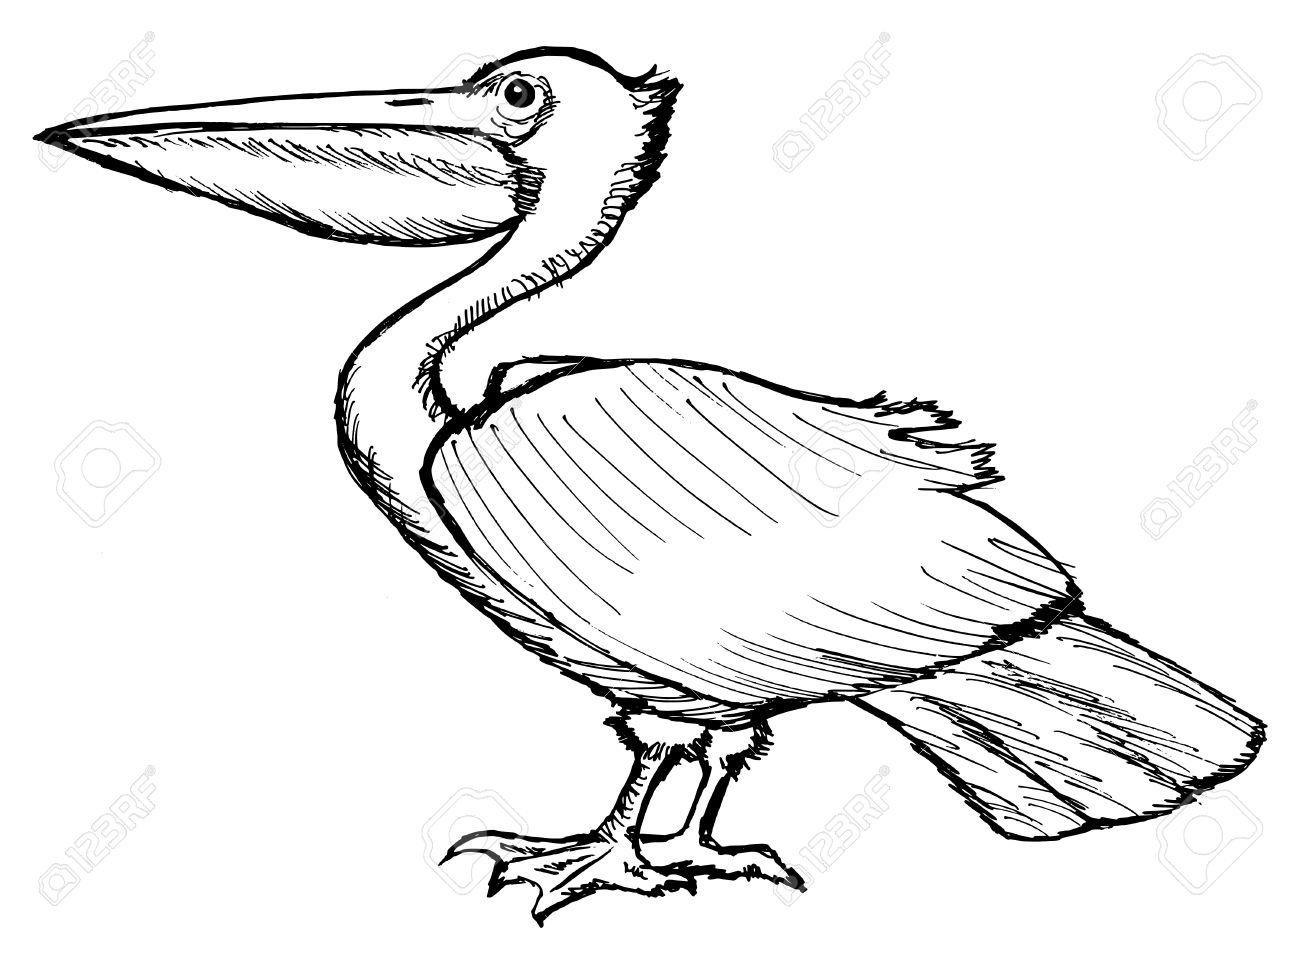 1300x974 Hand Drawn, Cartoon, Sketch Illustration Of Pelican Royalty Free